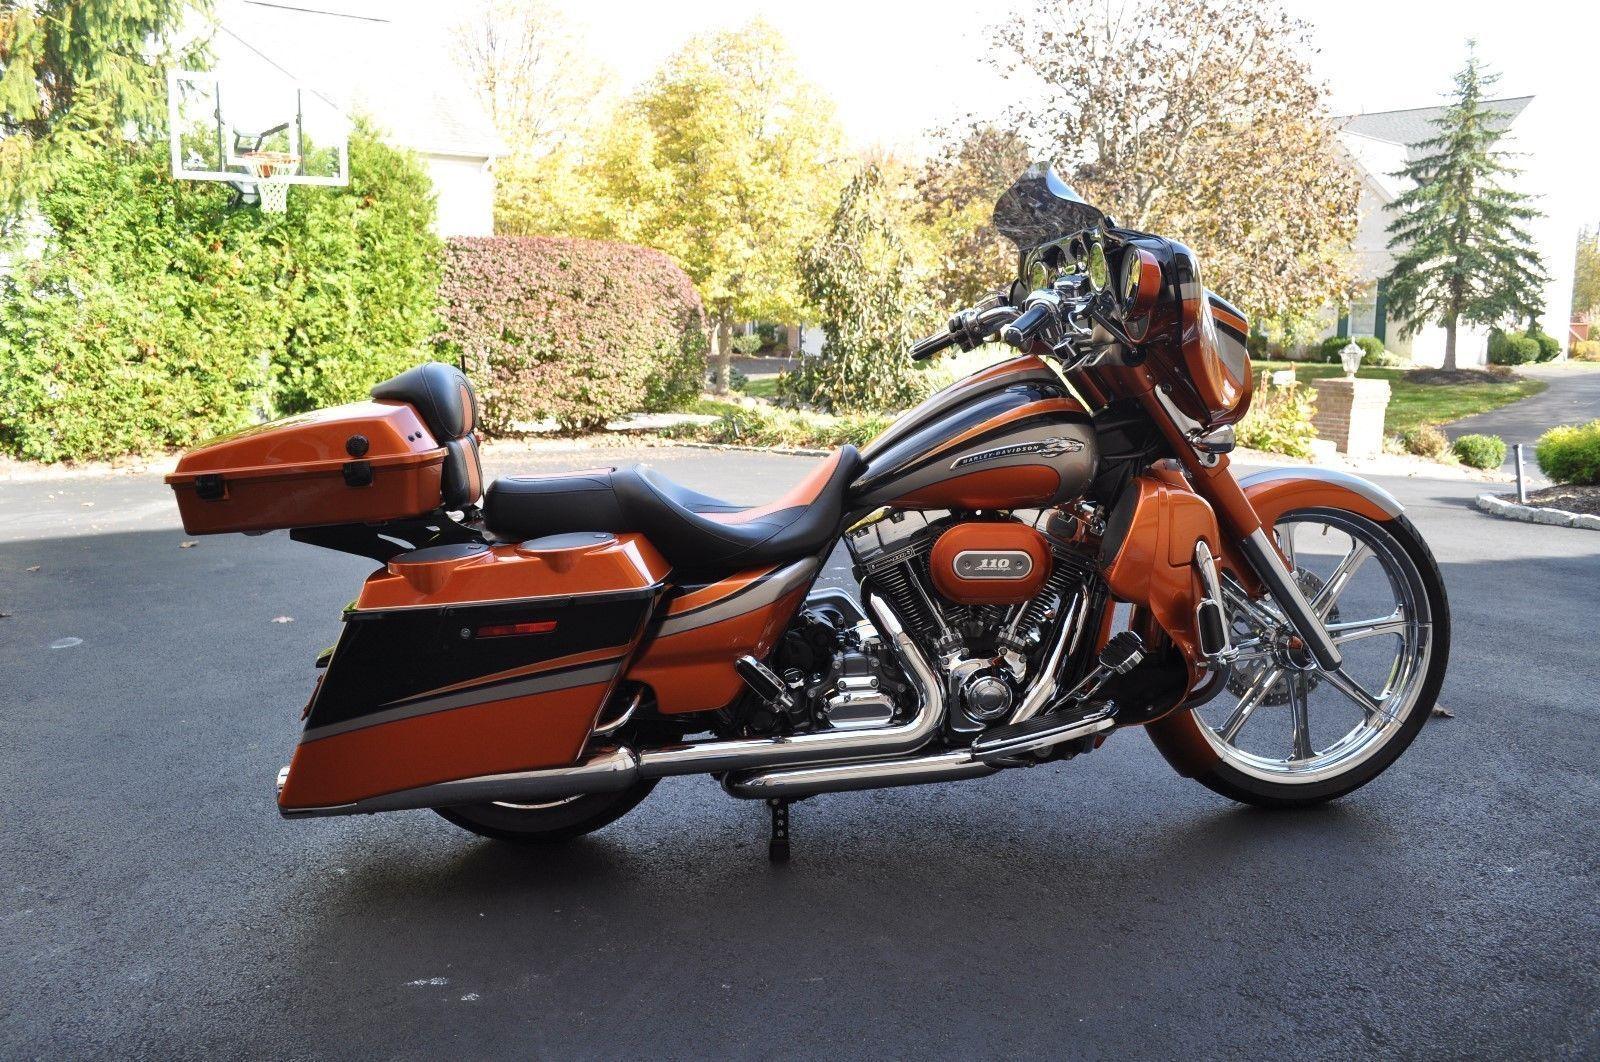 eBay: Harley-Davidson Touring Harley-Davidson CVO Street Glide ...